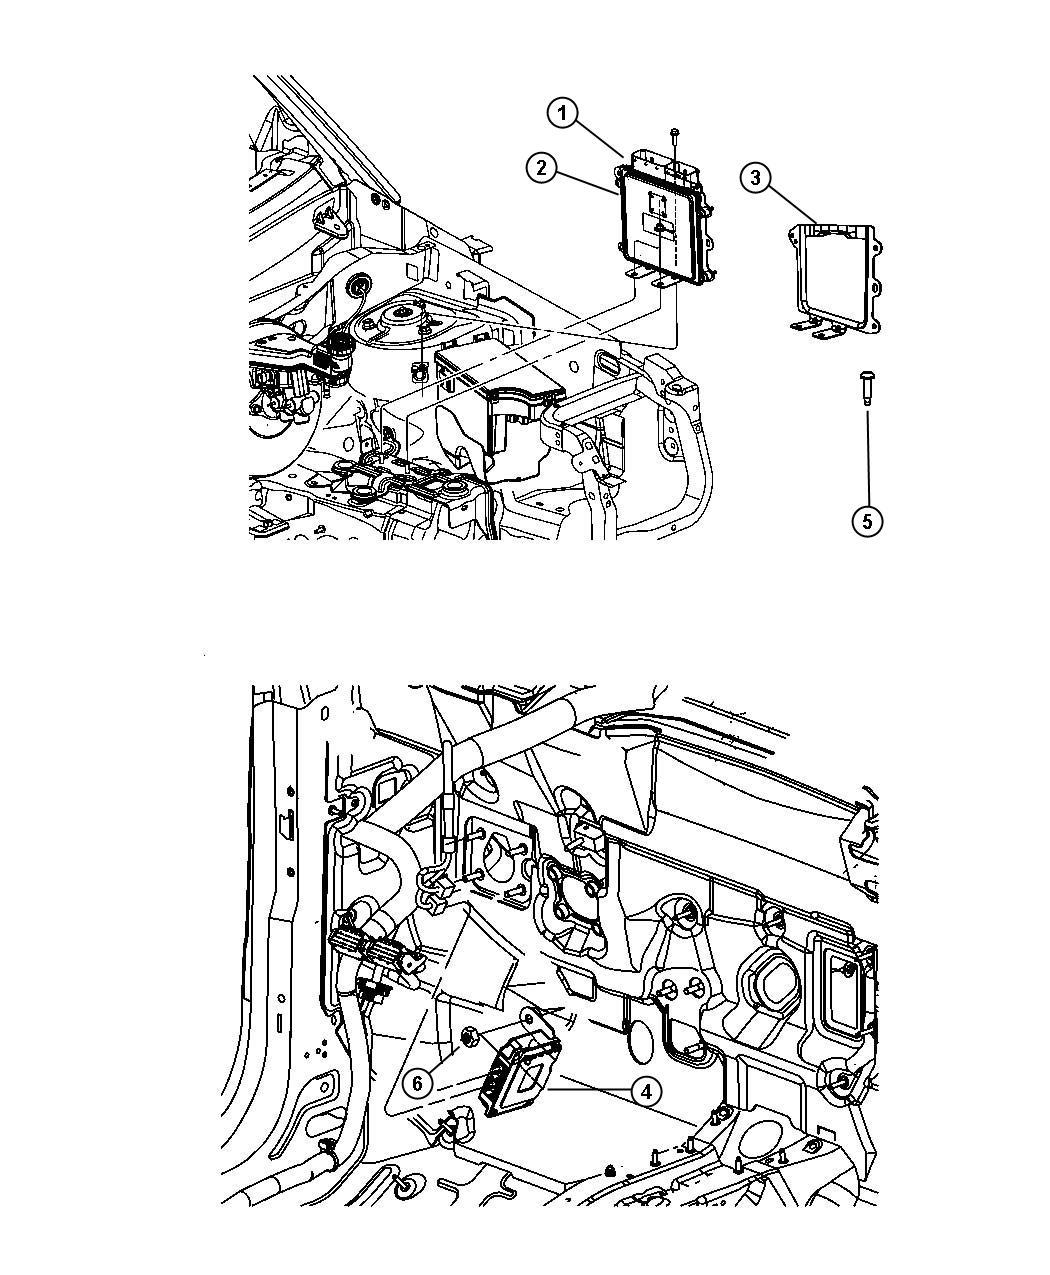 2009 Jeep Patriot Engine Diagram : 2010 jeep patriot module transmission control crawl ~ A.2002-acura-tl-radio.info Haus und Dekorationen